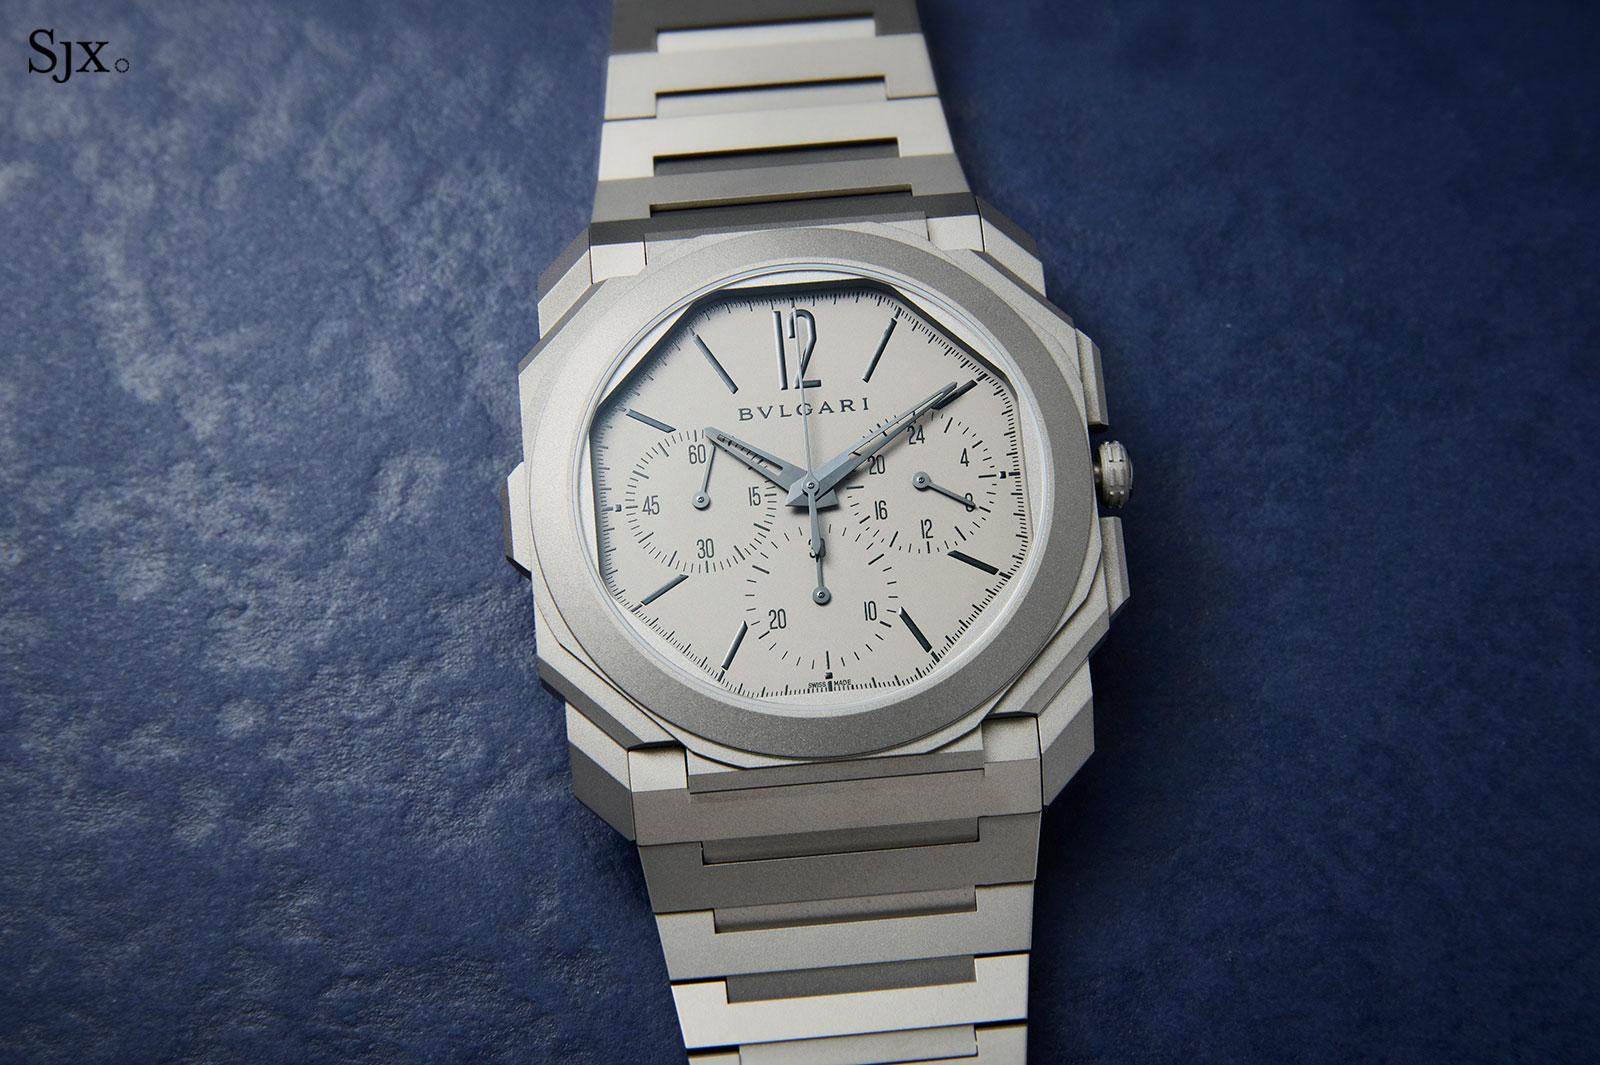 Bulgari Octo Finissimo Chronograph GMT Automatic 1